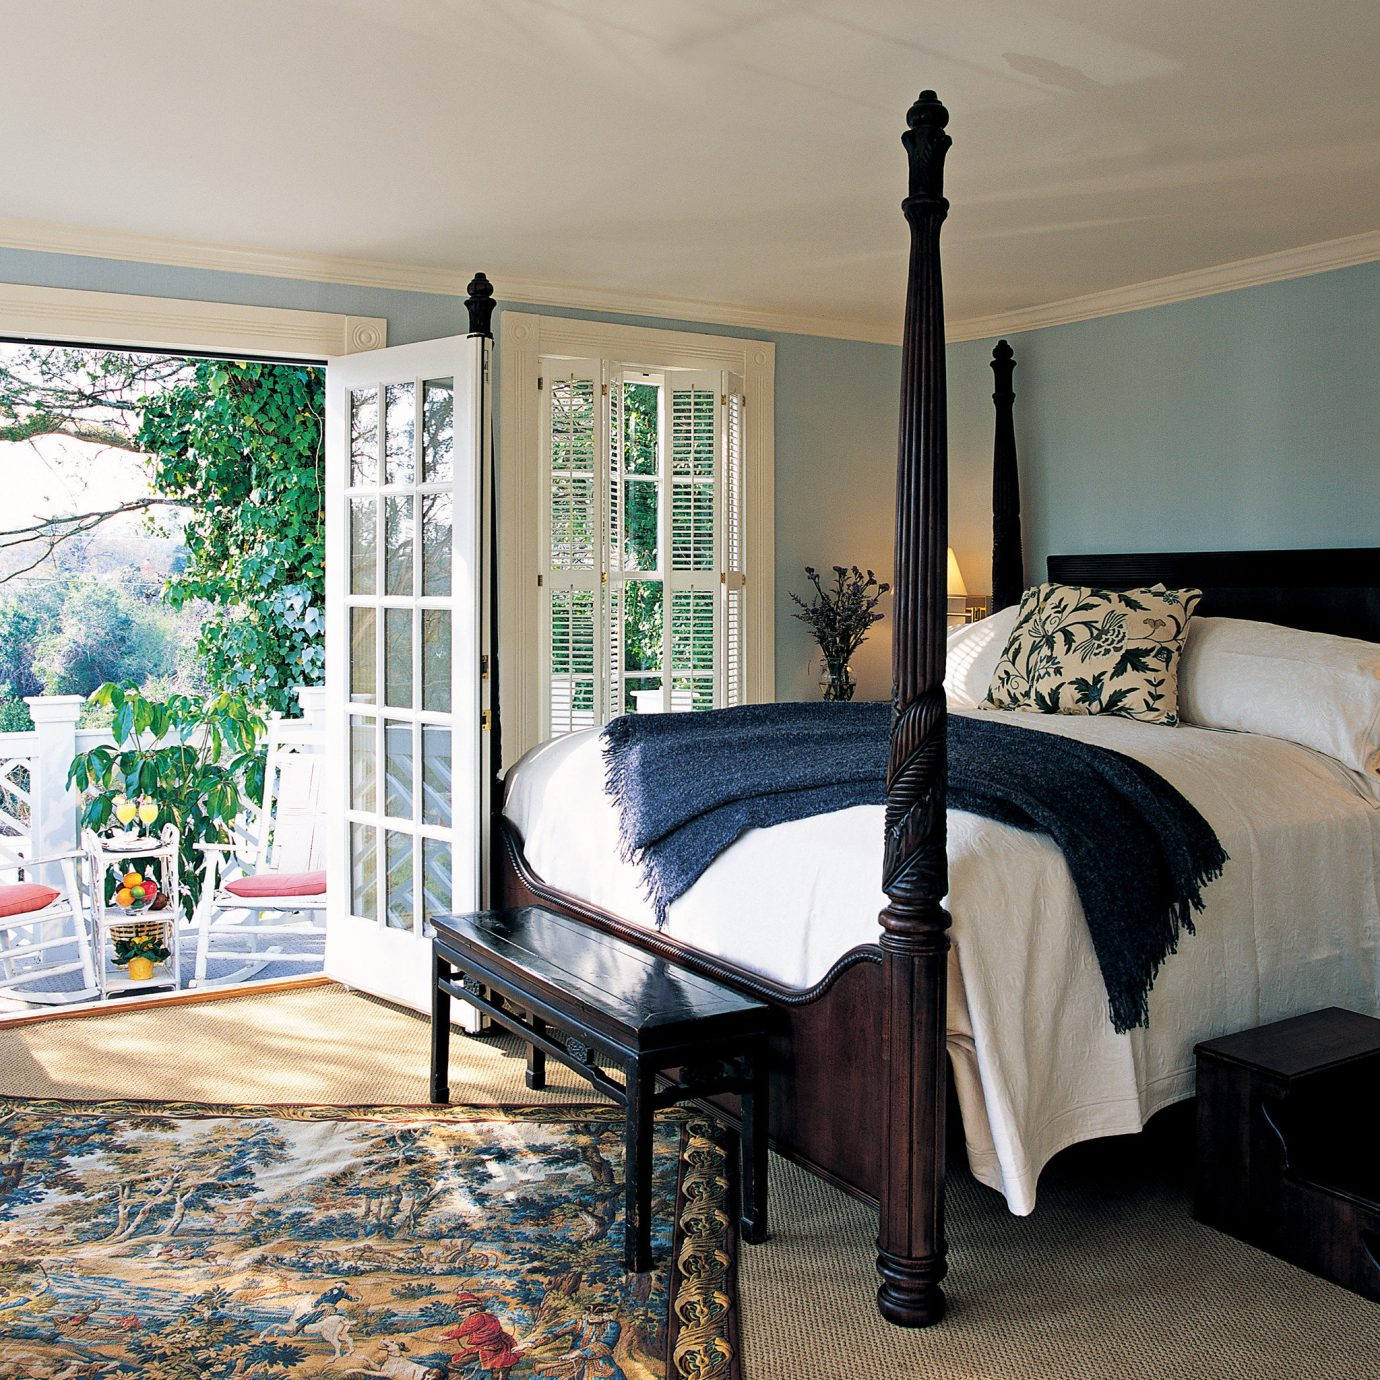 Bedroom Classic Suite property home living room bed sheet cottage rug